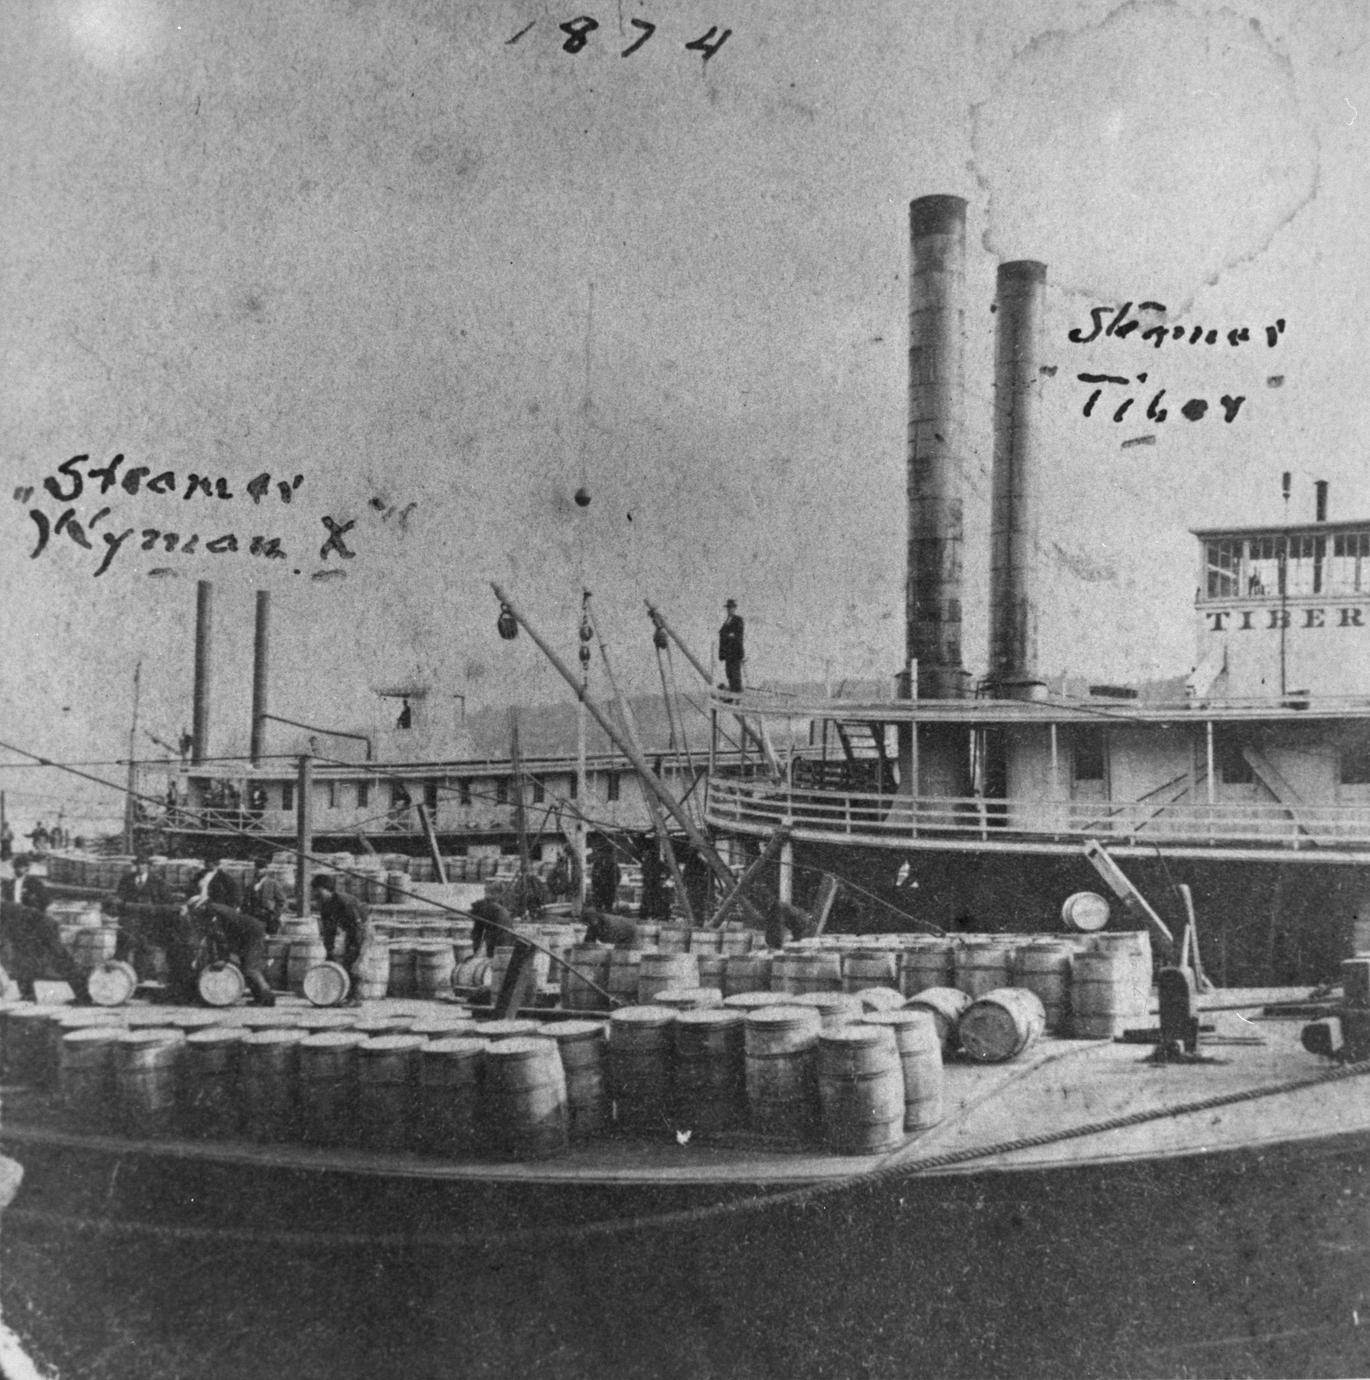 Tiber (Towboat/Rafter, 1862-1888)